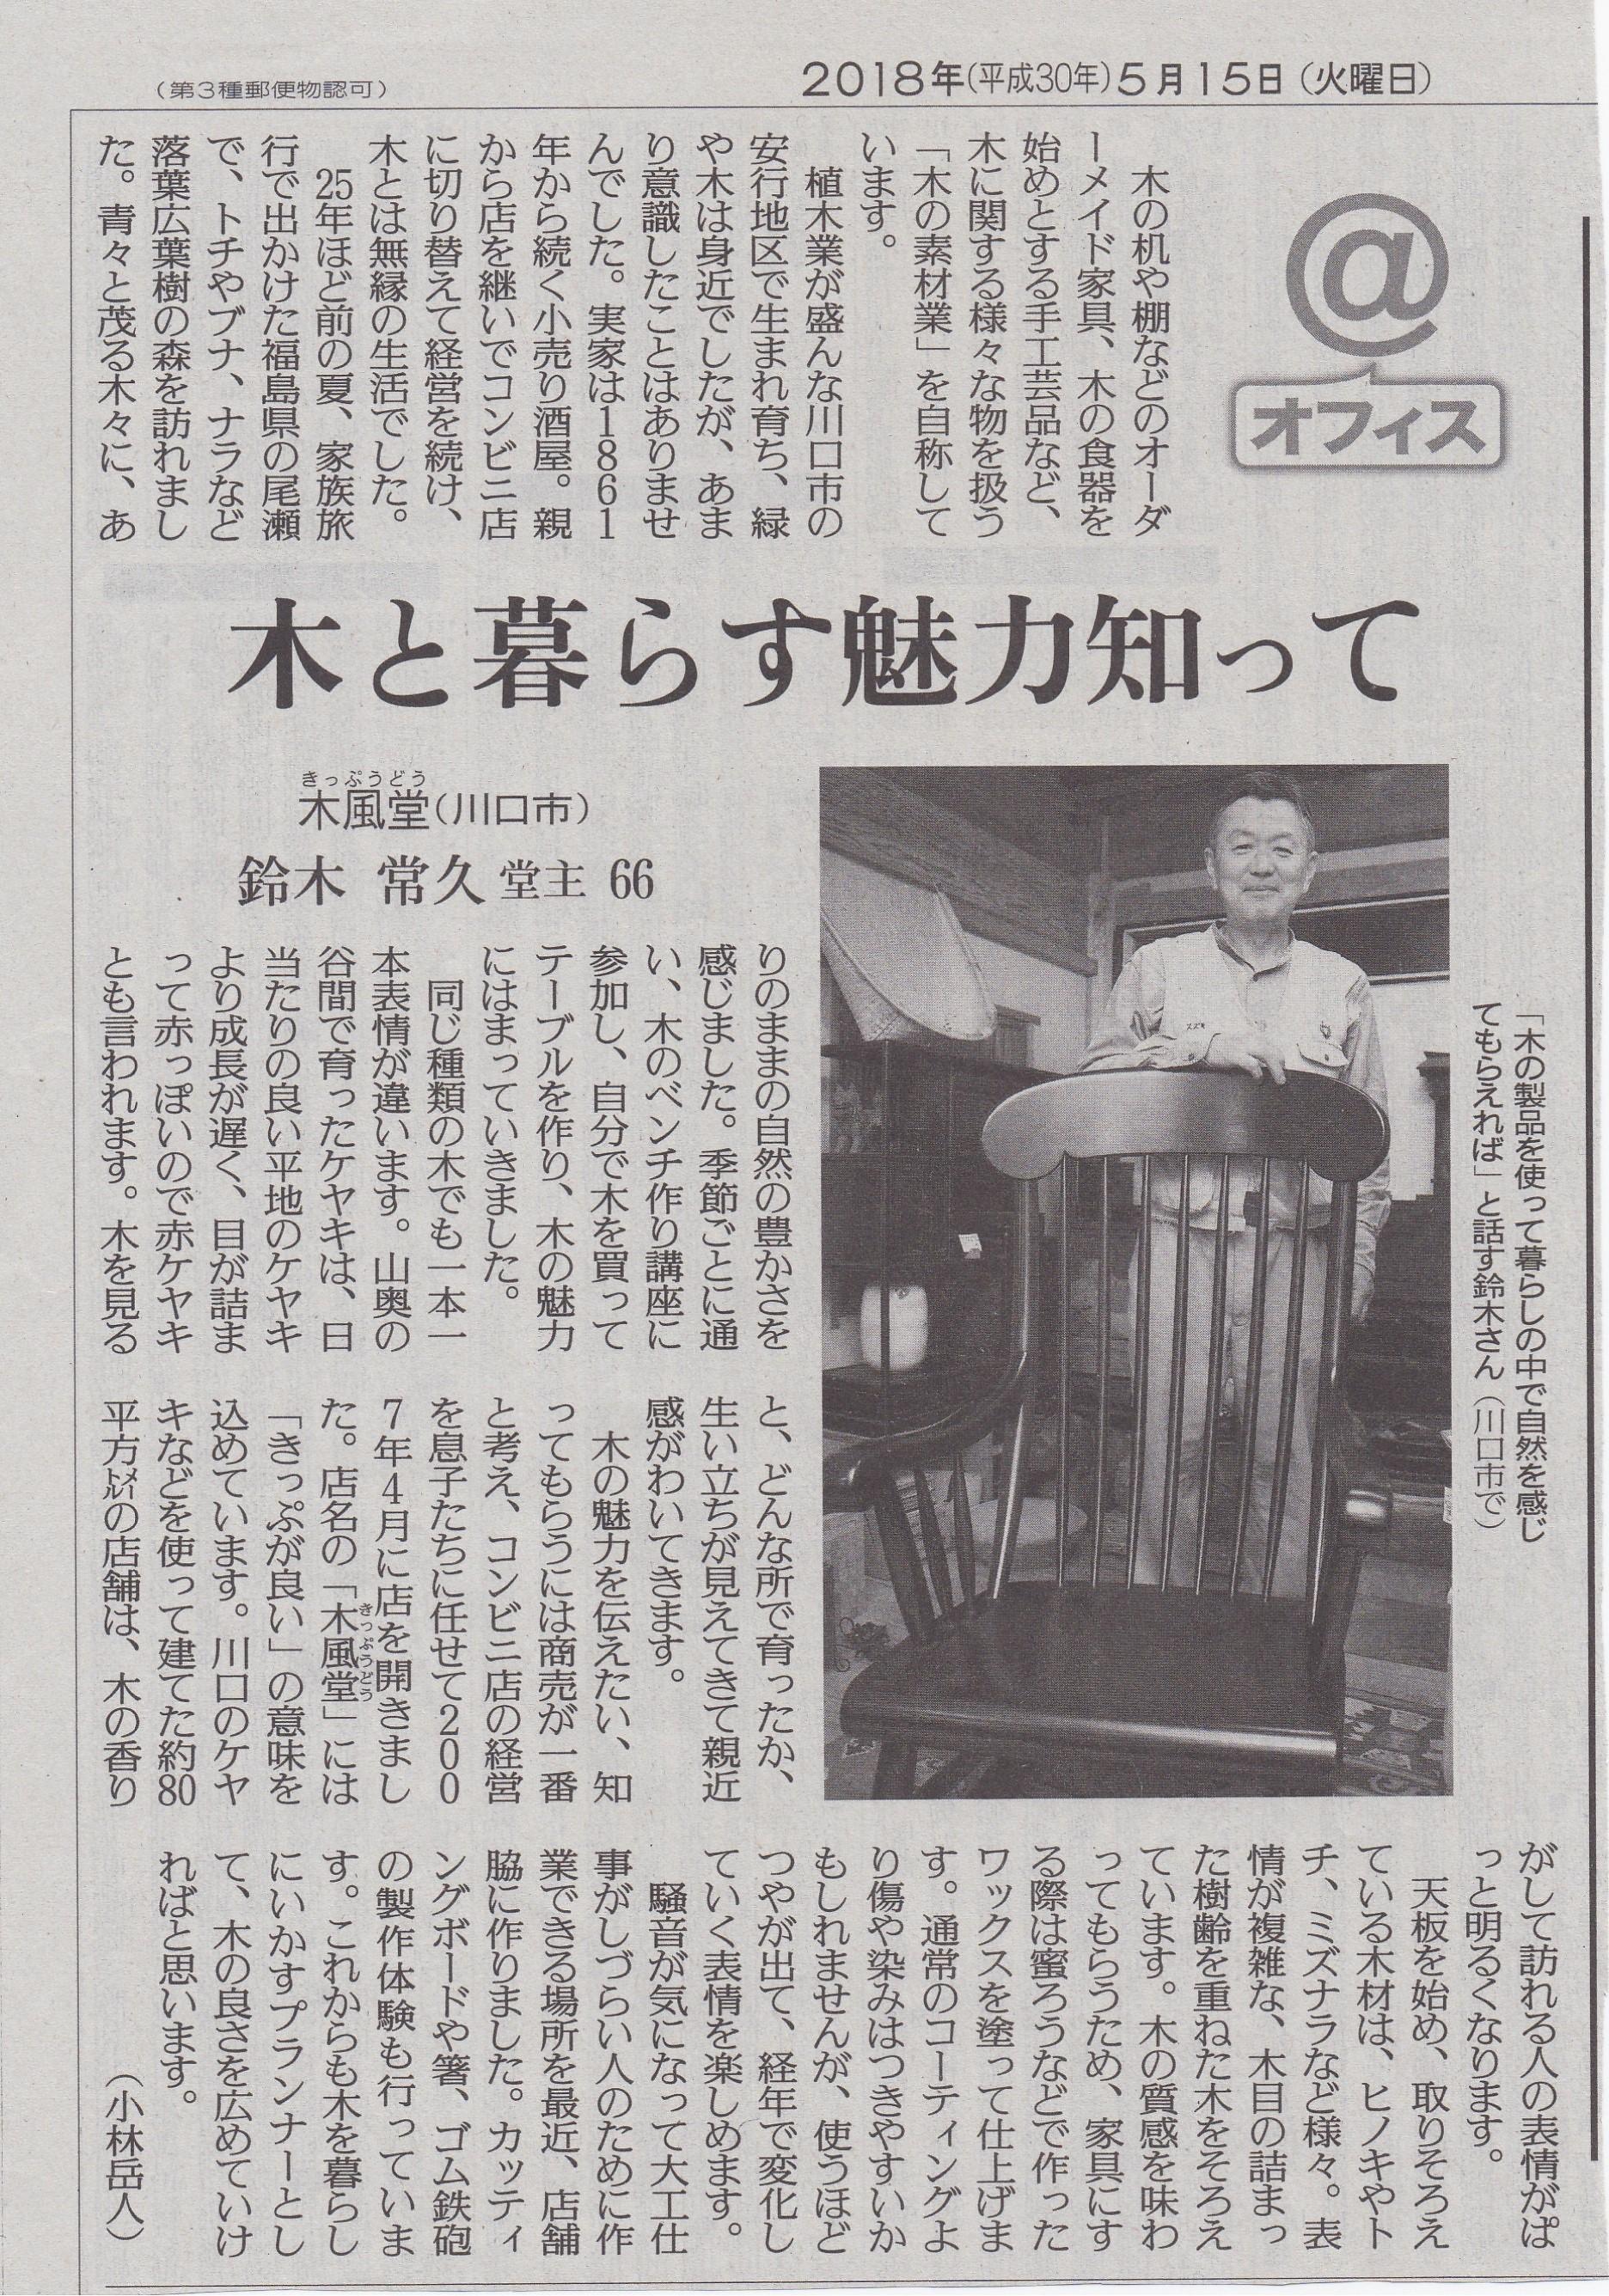 20180515yomiuri